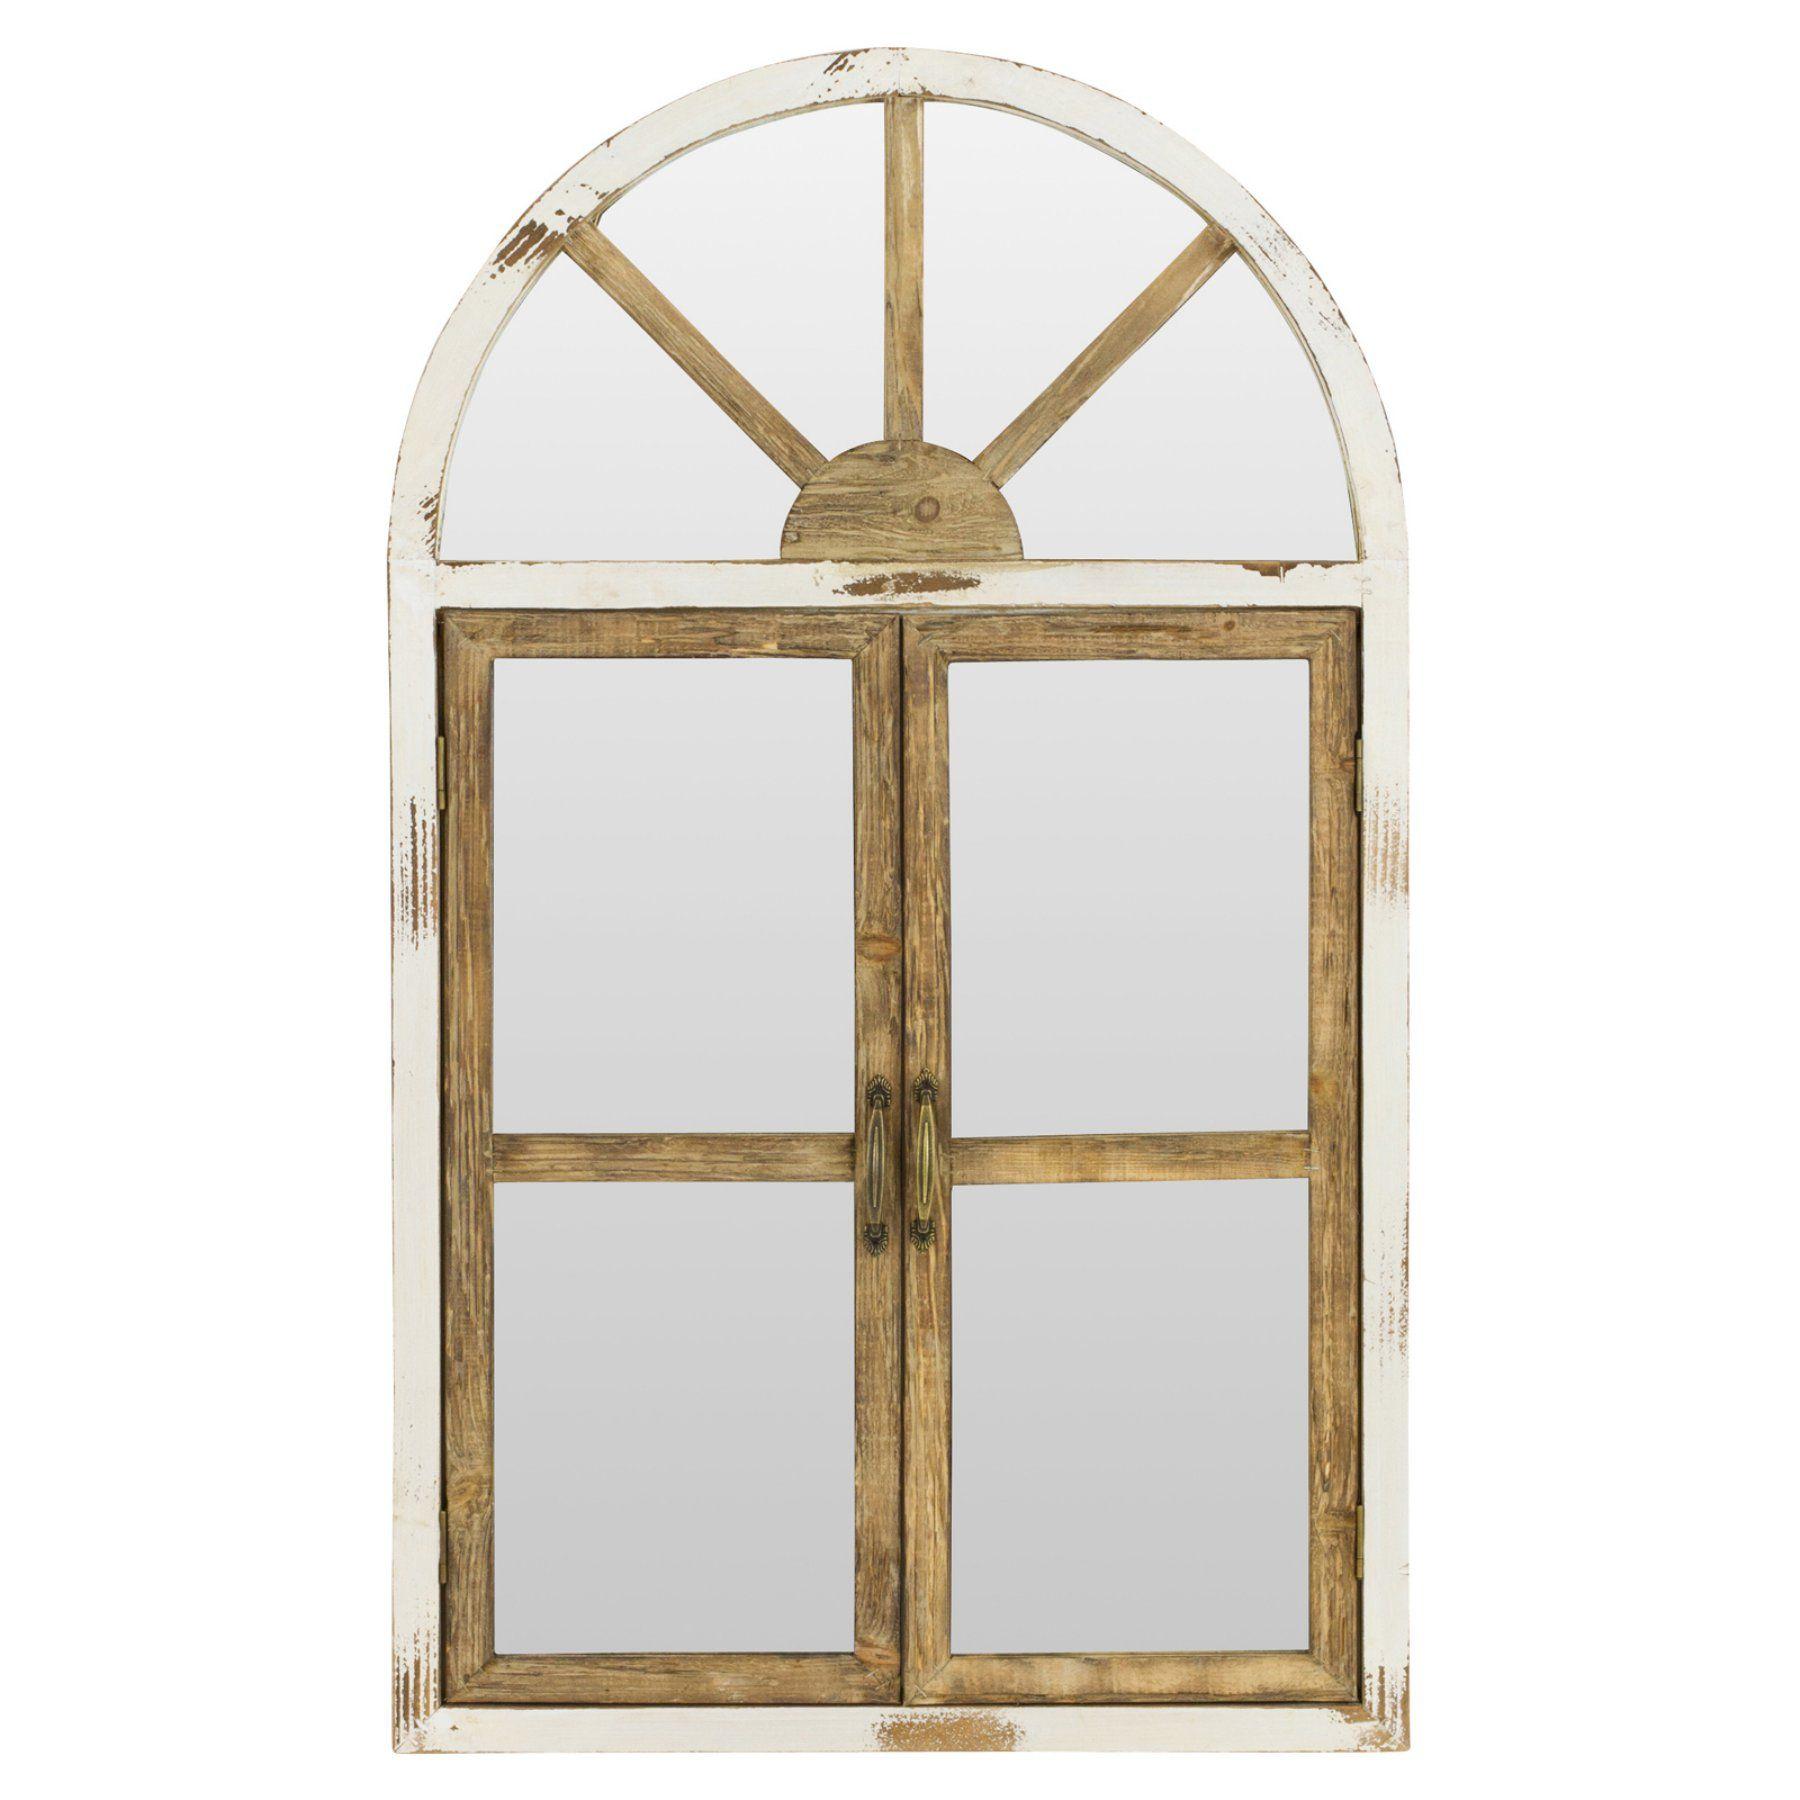 Window pane decor aspire home accents portico arch window pane wall mirror  w x h